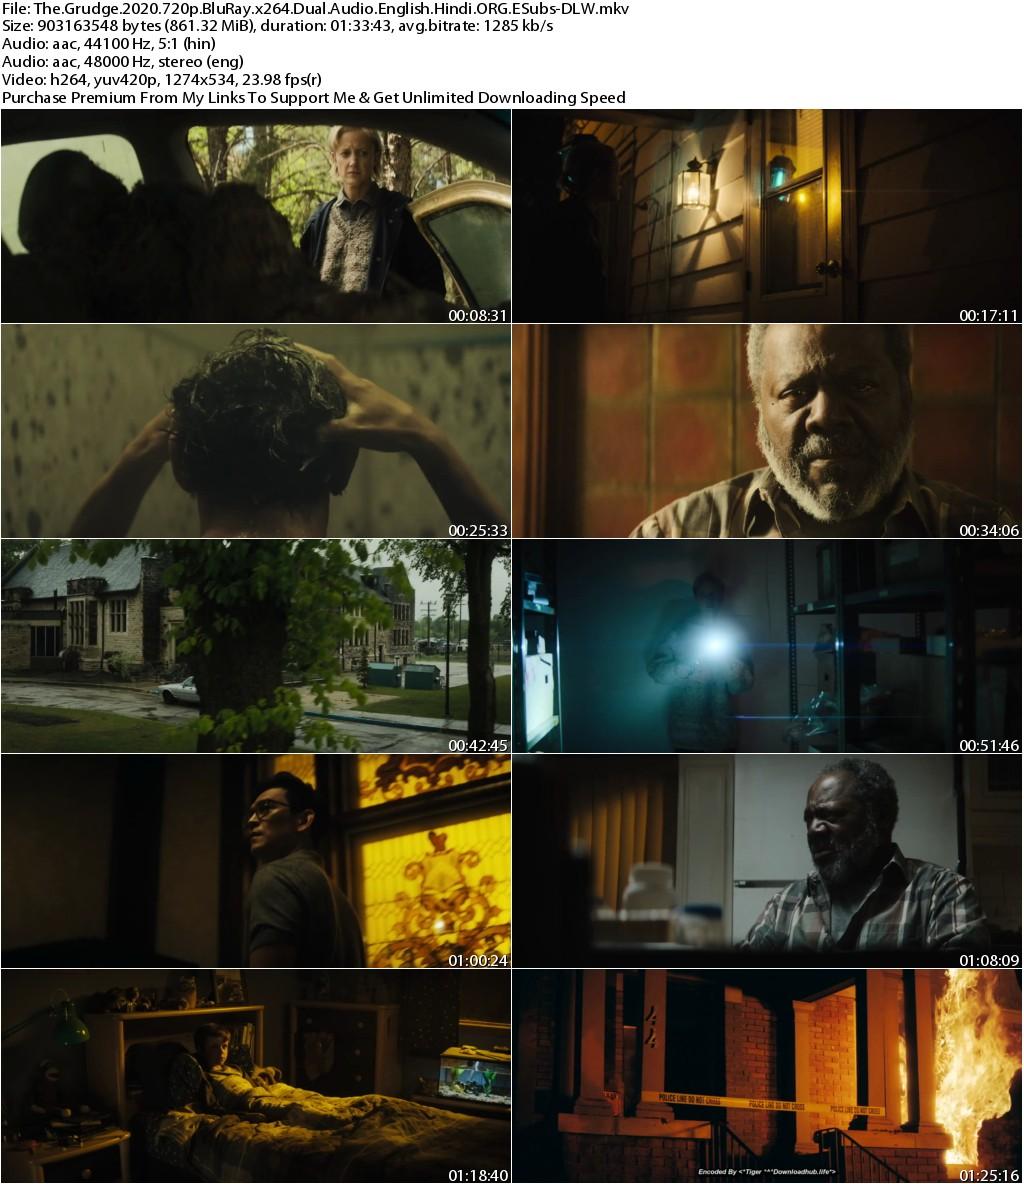 The Grudge (2020) 720p BluRay x264 Dual Audio English Hindi ORG ESubs-DLW